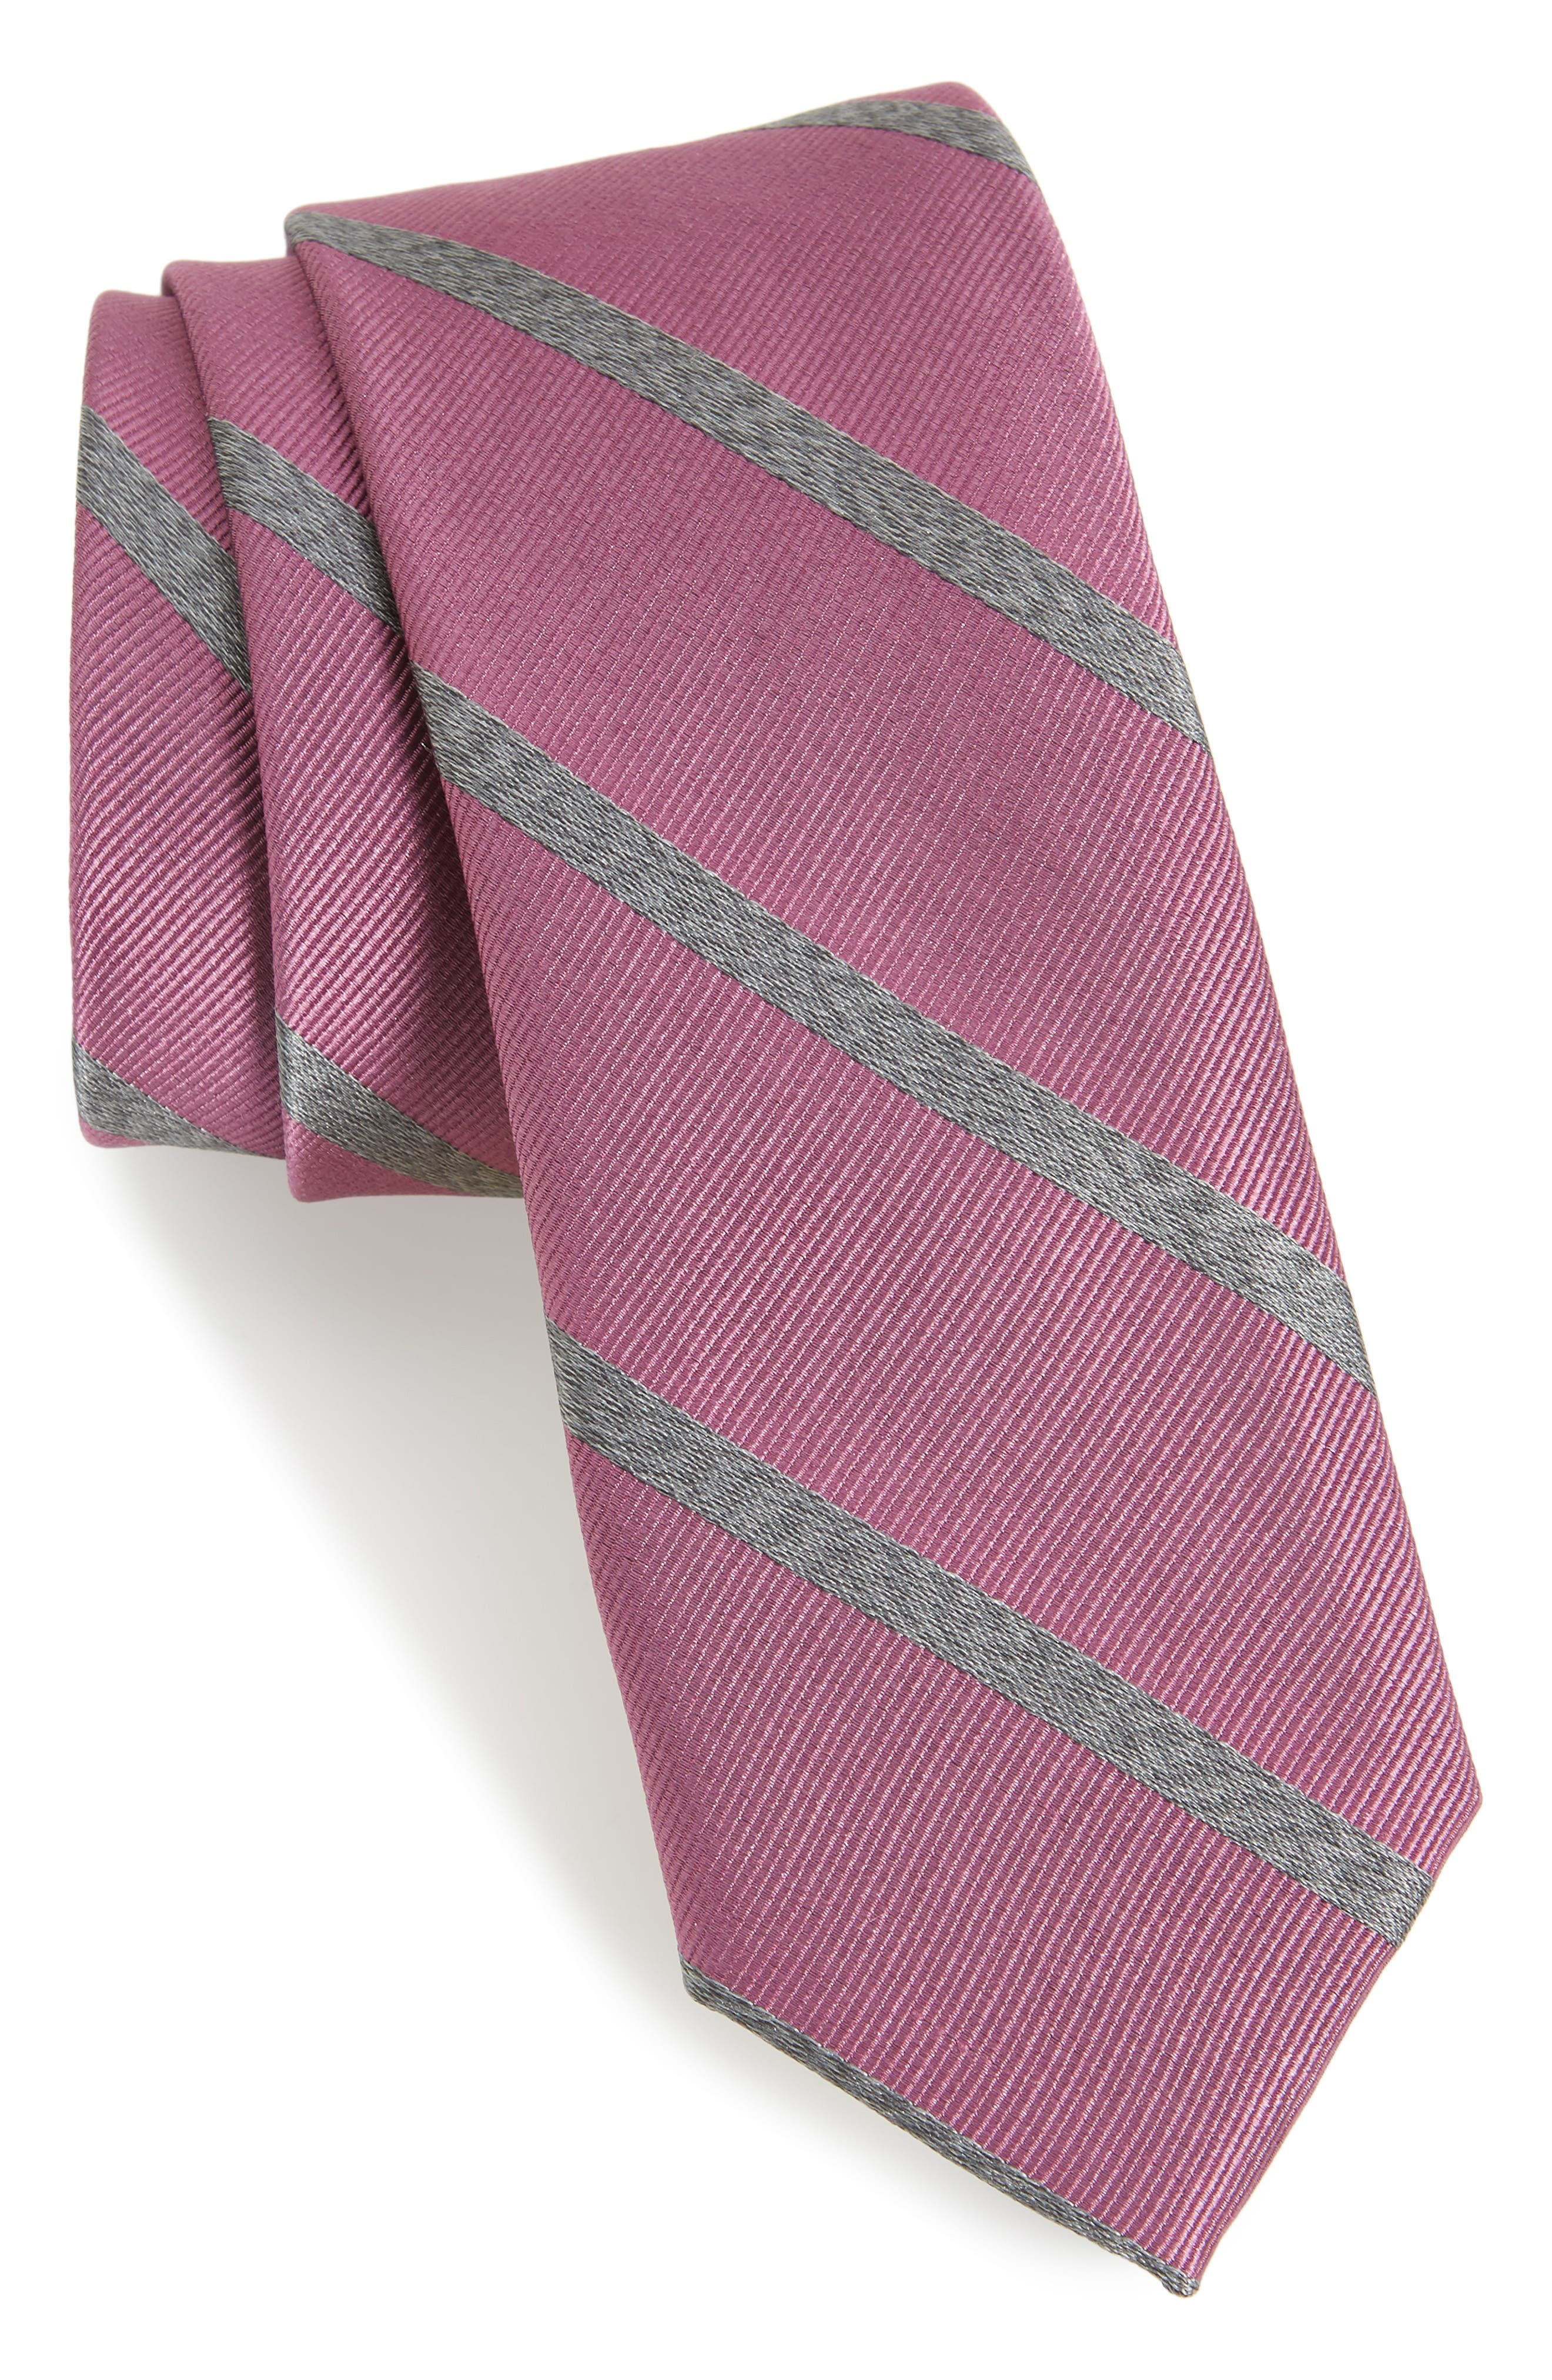 Wheelhouse Stripe Silk Tie,                             Main thumbnail 1, color,                             Dusty Rose